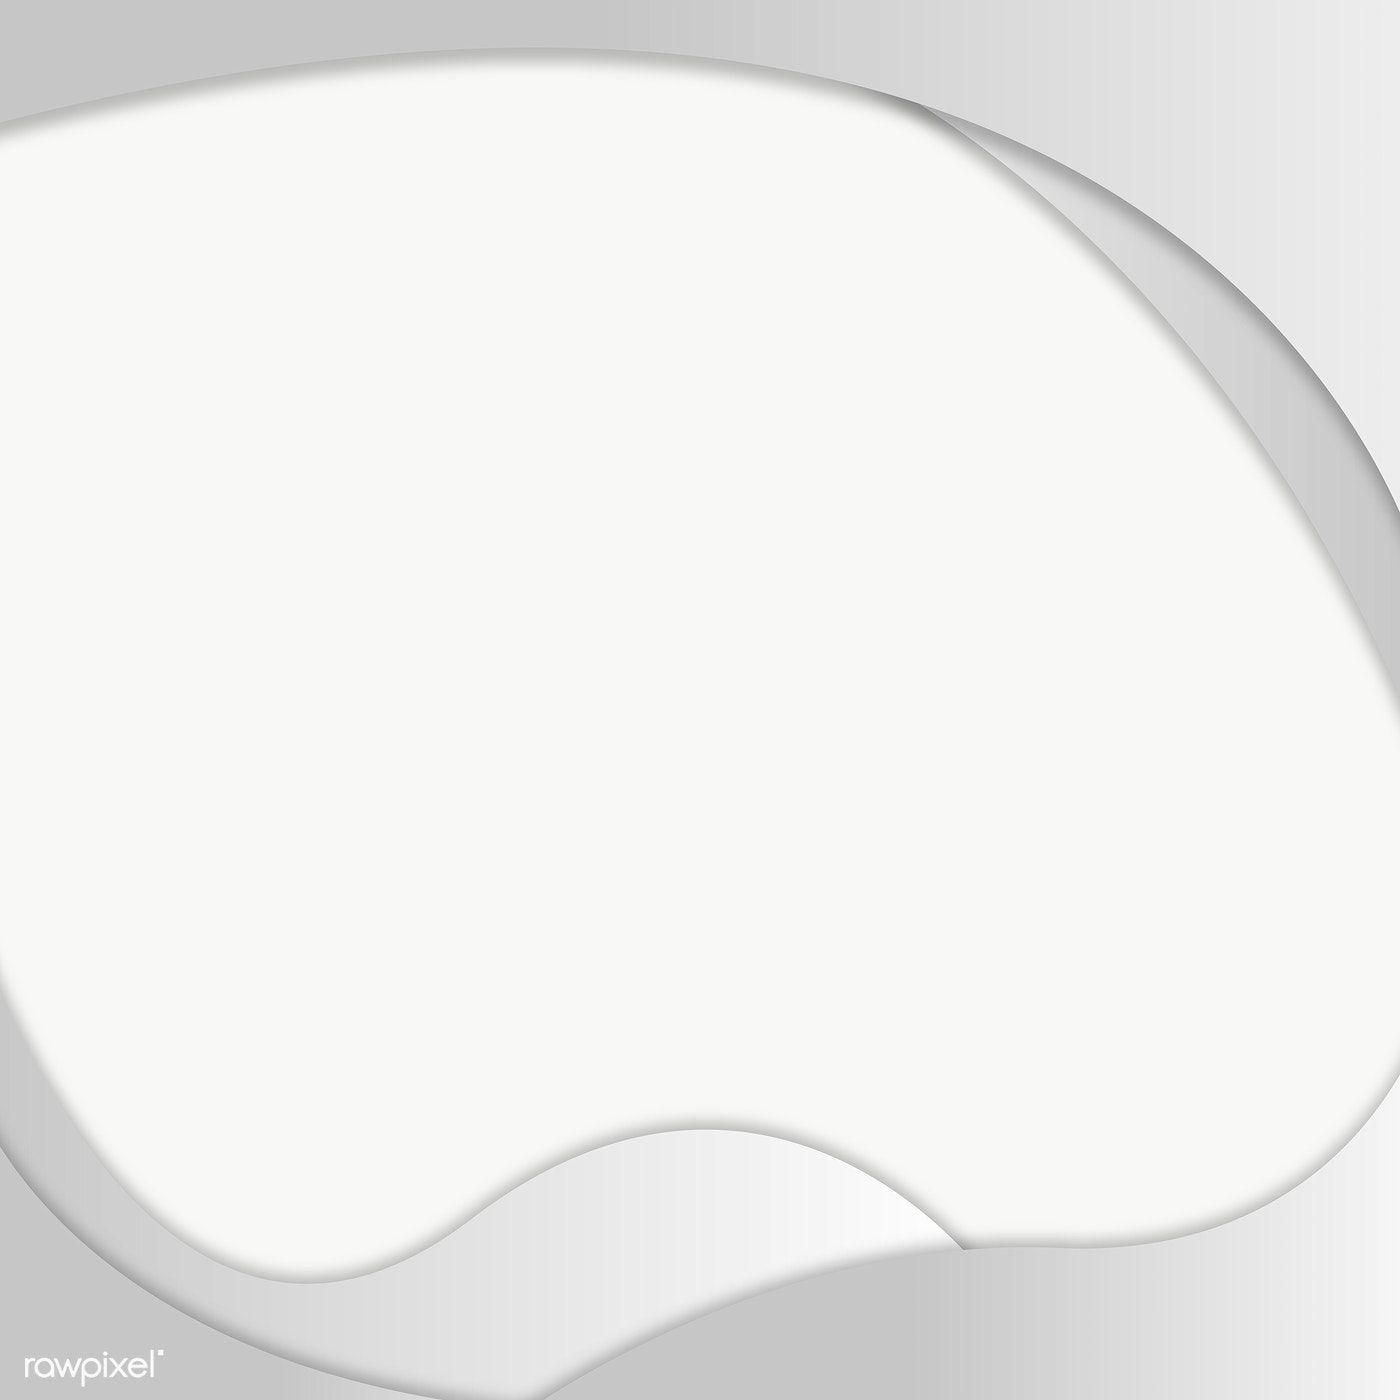 Gray Fluid Shape Frame Design Element Free Image By Rawpixel Com Mind Frame Design Design Element Frame